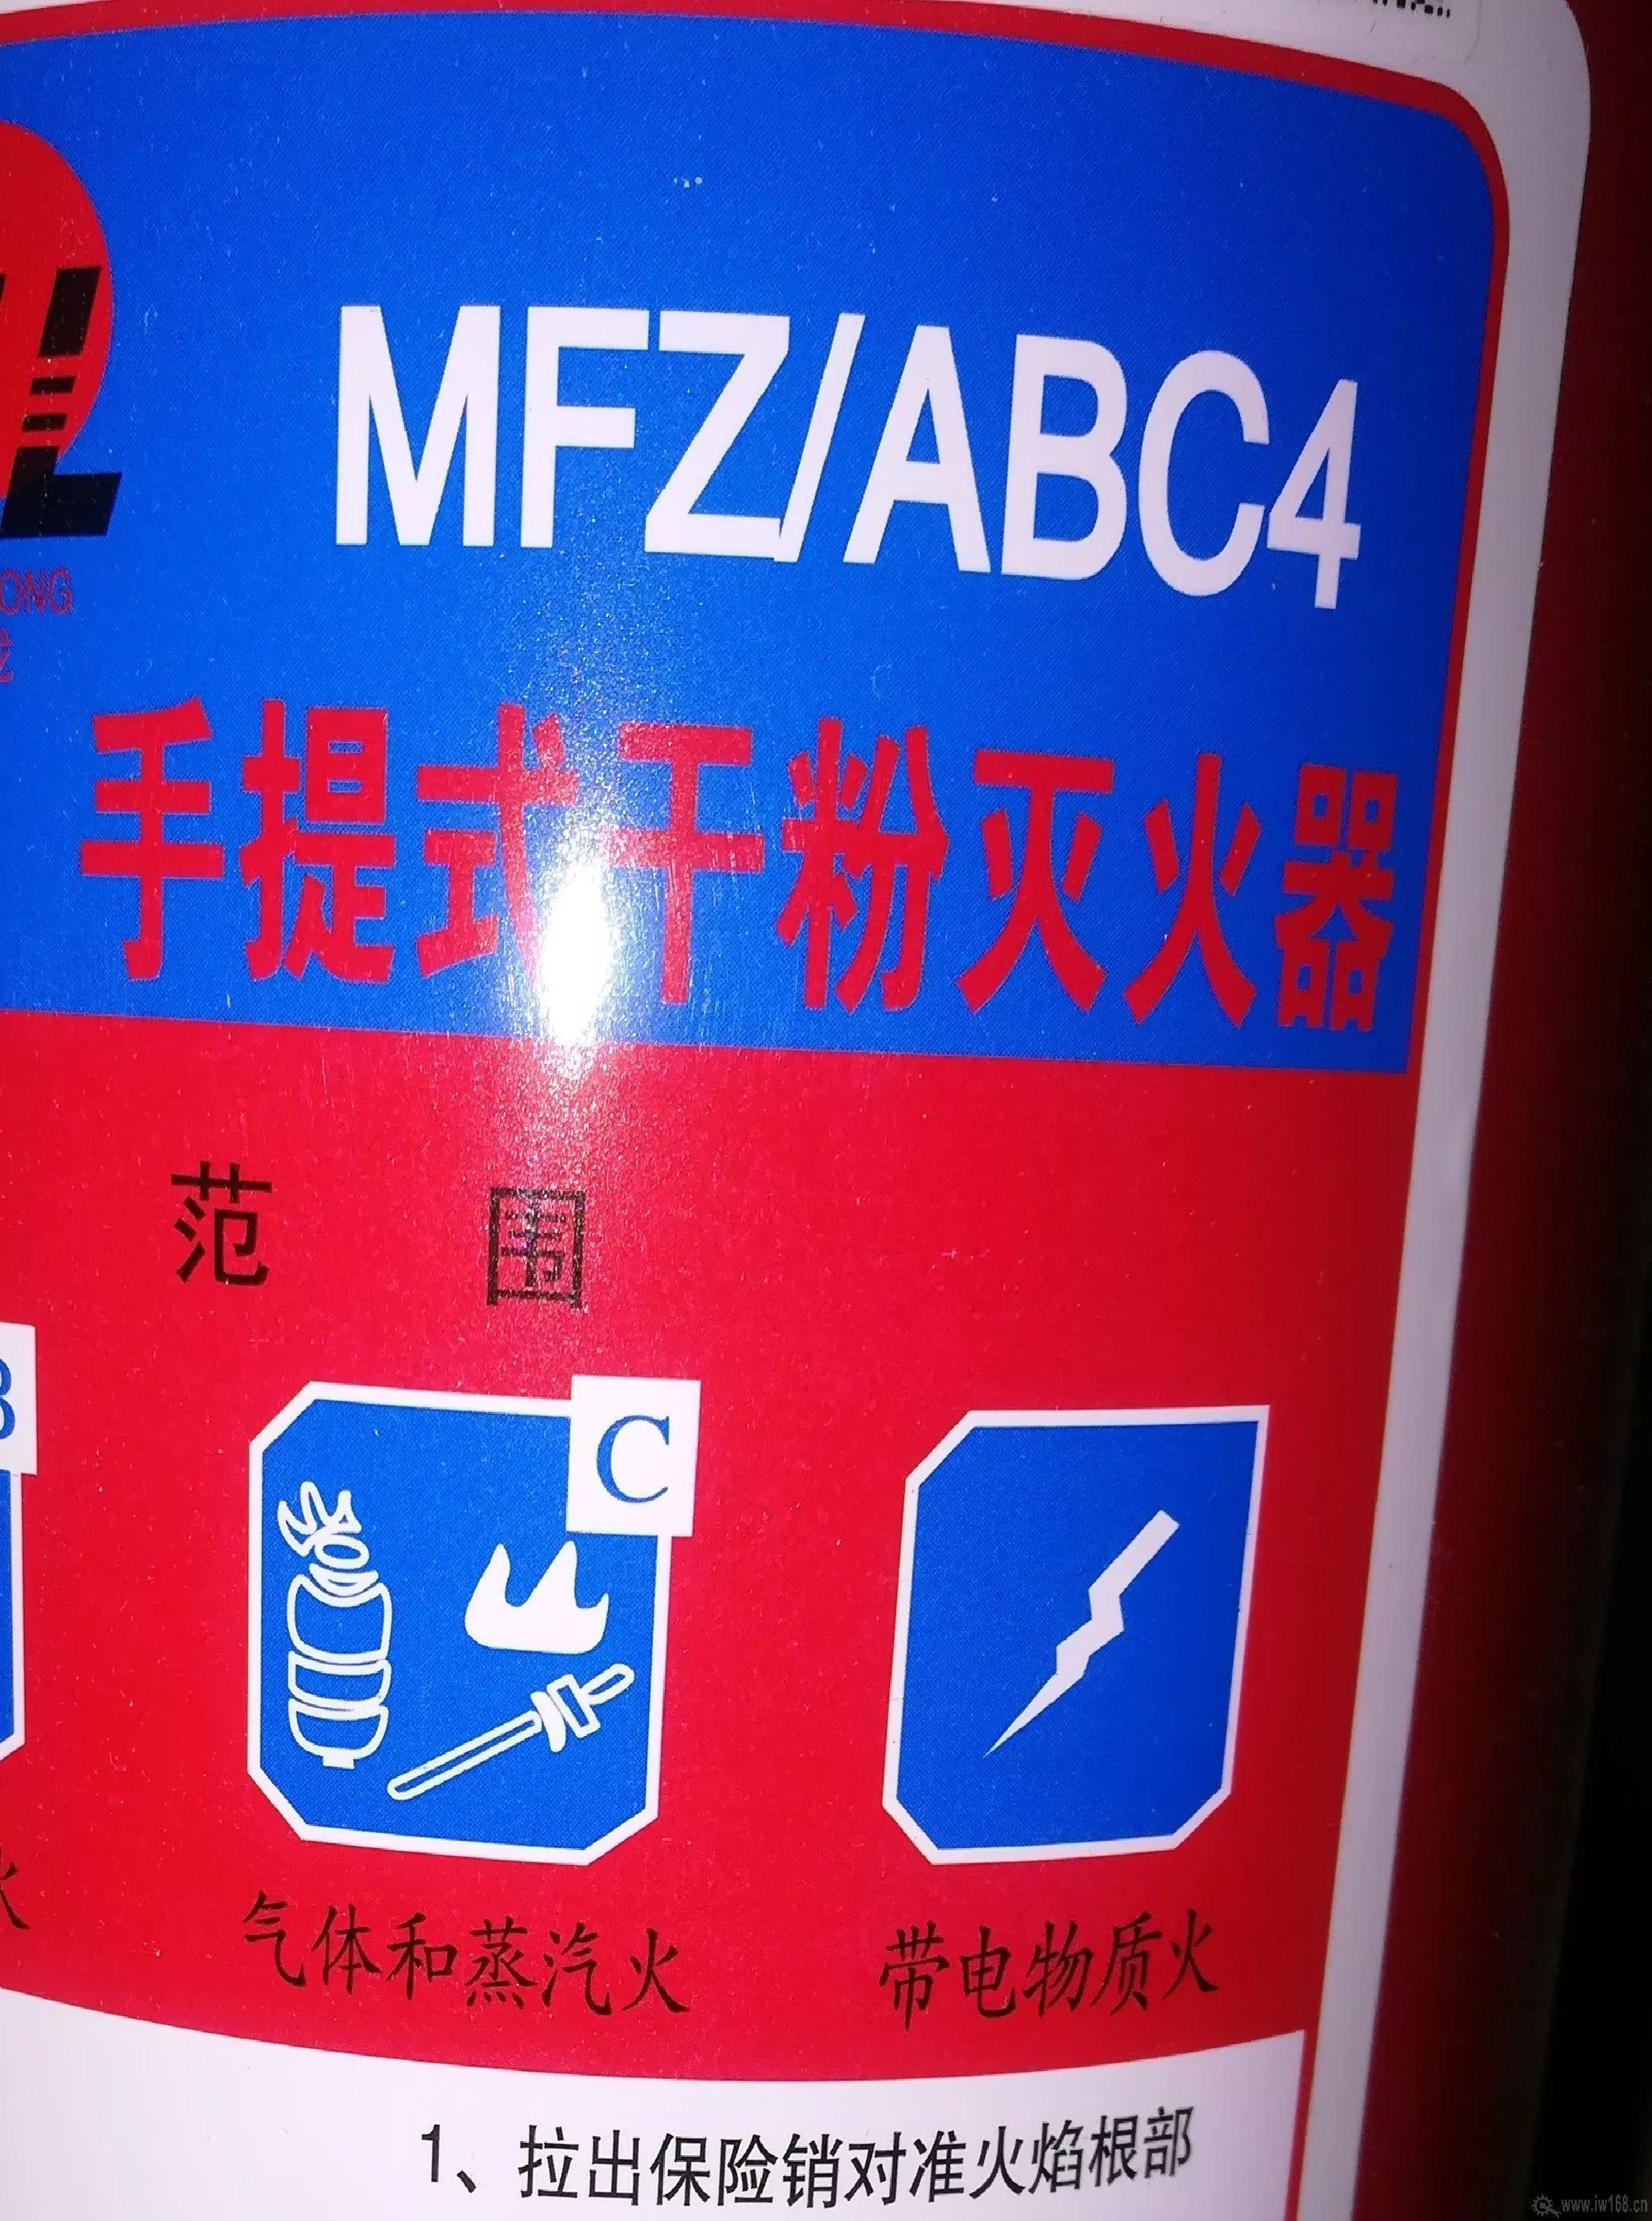 msq9——容积为9l的手提式清水灭火器   mft50——50kg推车式干粉灭火器   mfz/abc4——4kgabc贮压式干粉灭火剂(z表示贮压式)